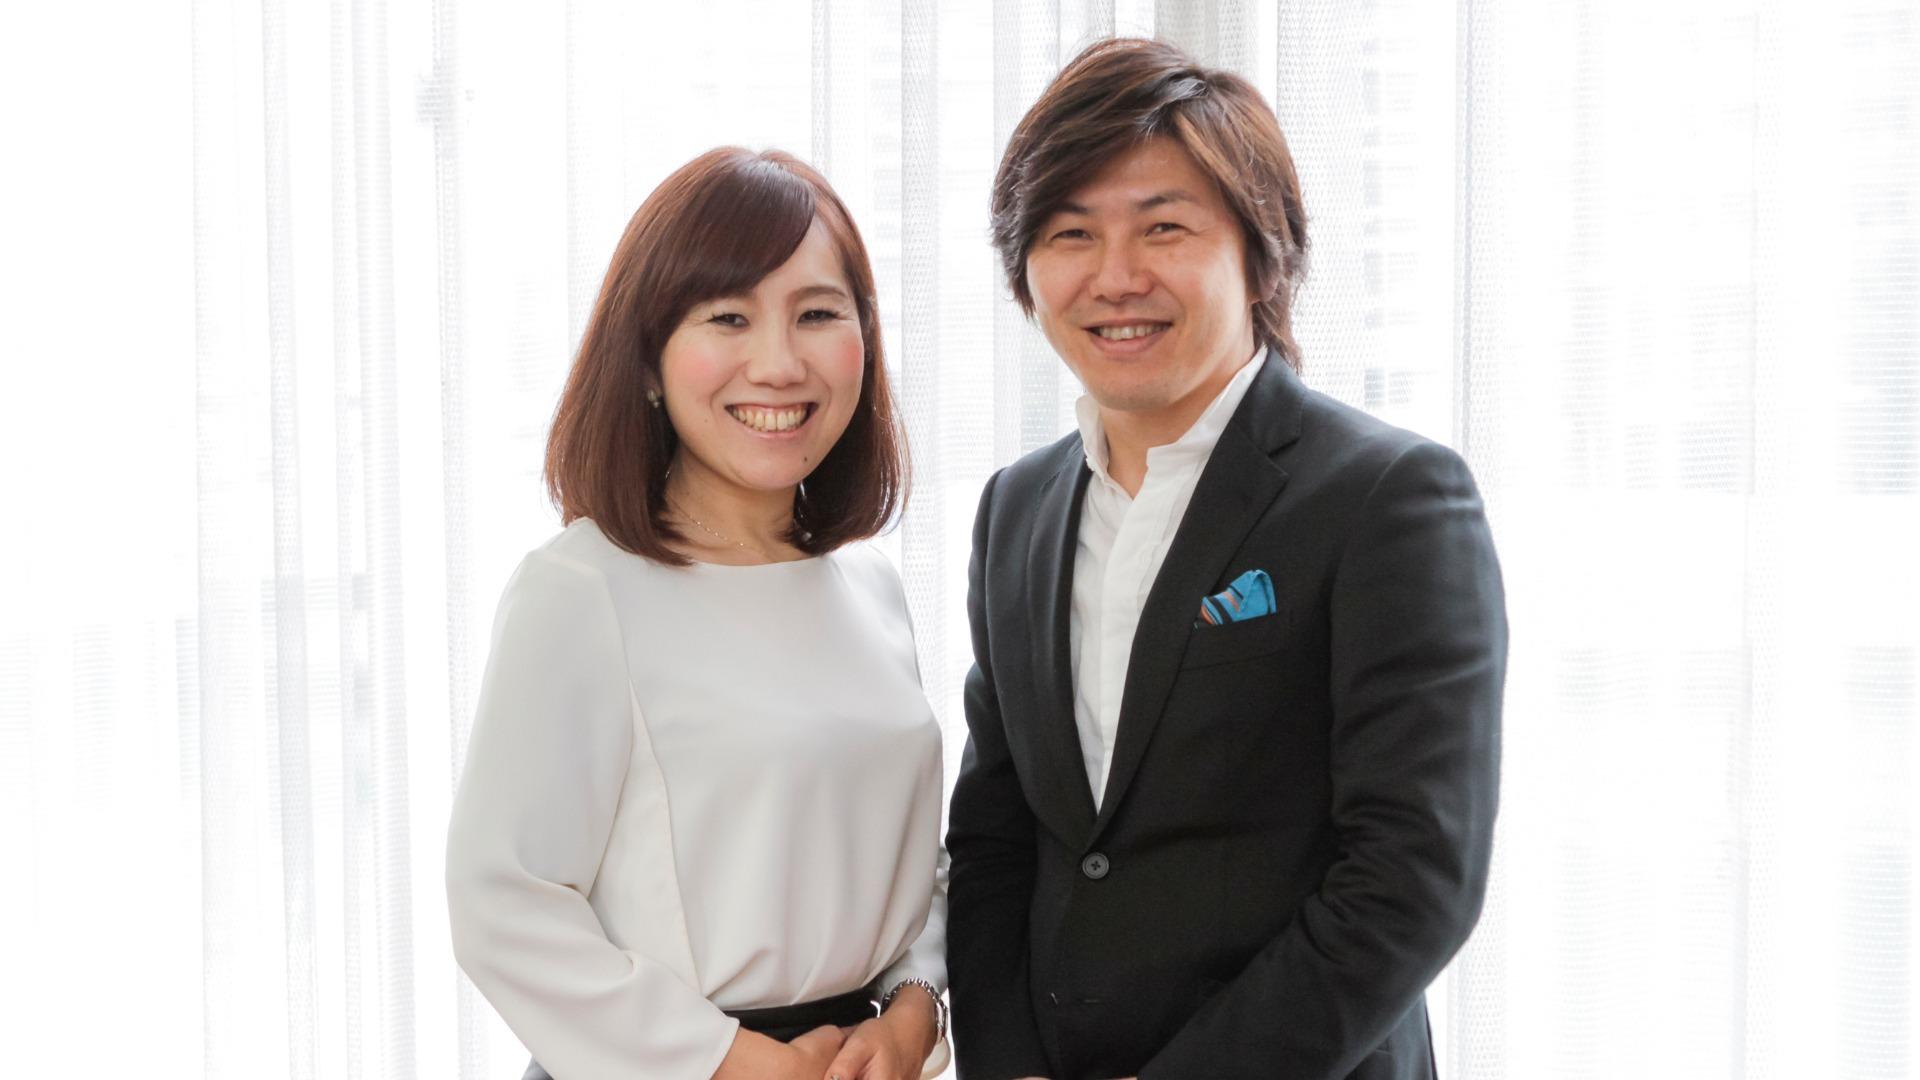 NPOふくりび 理事長 赤木 勝幸 & 事務局長 岩岡 ひとみ